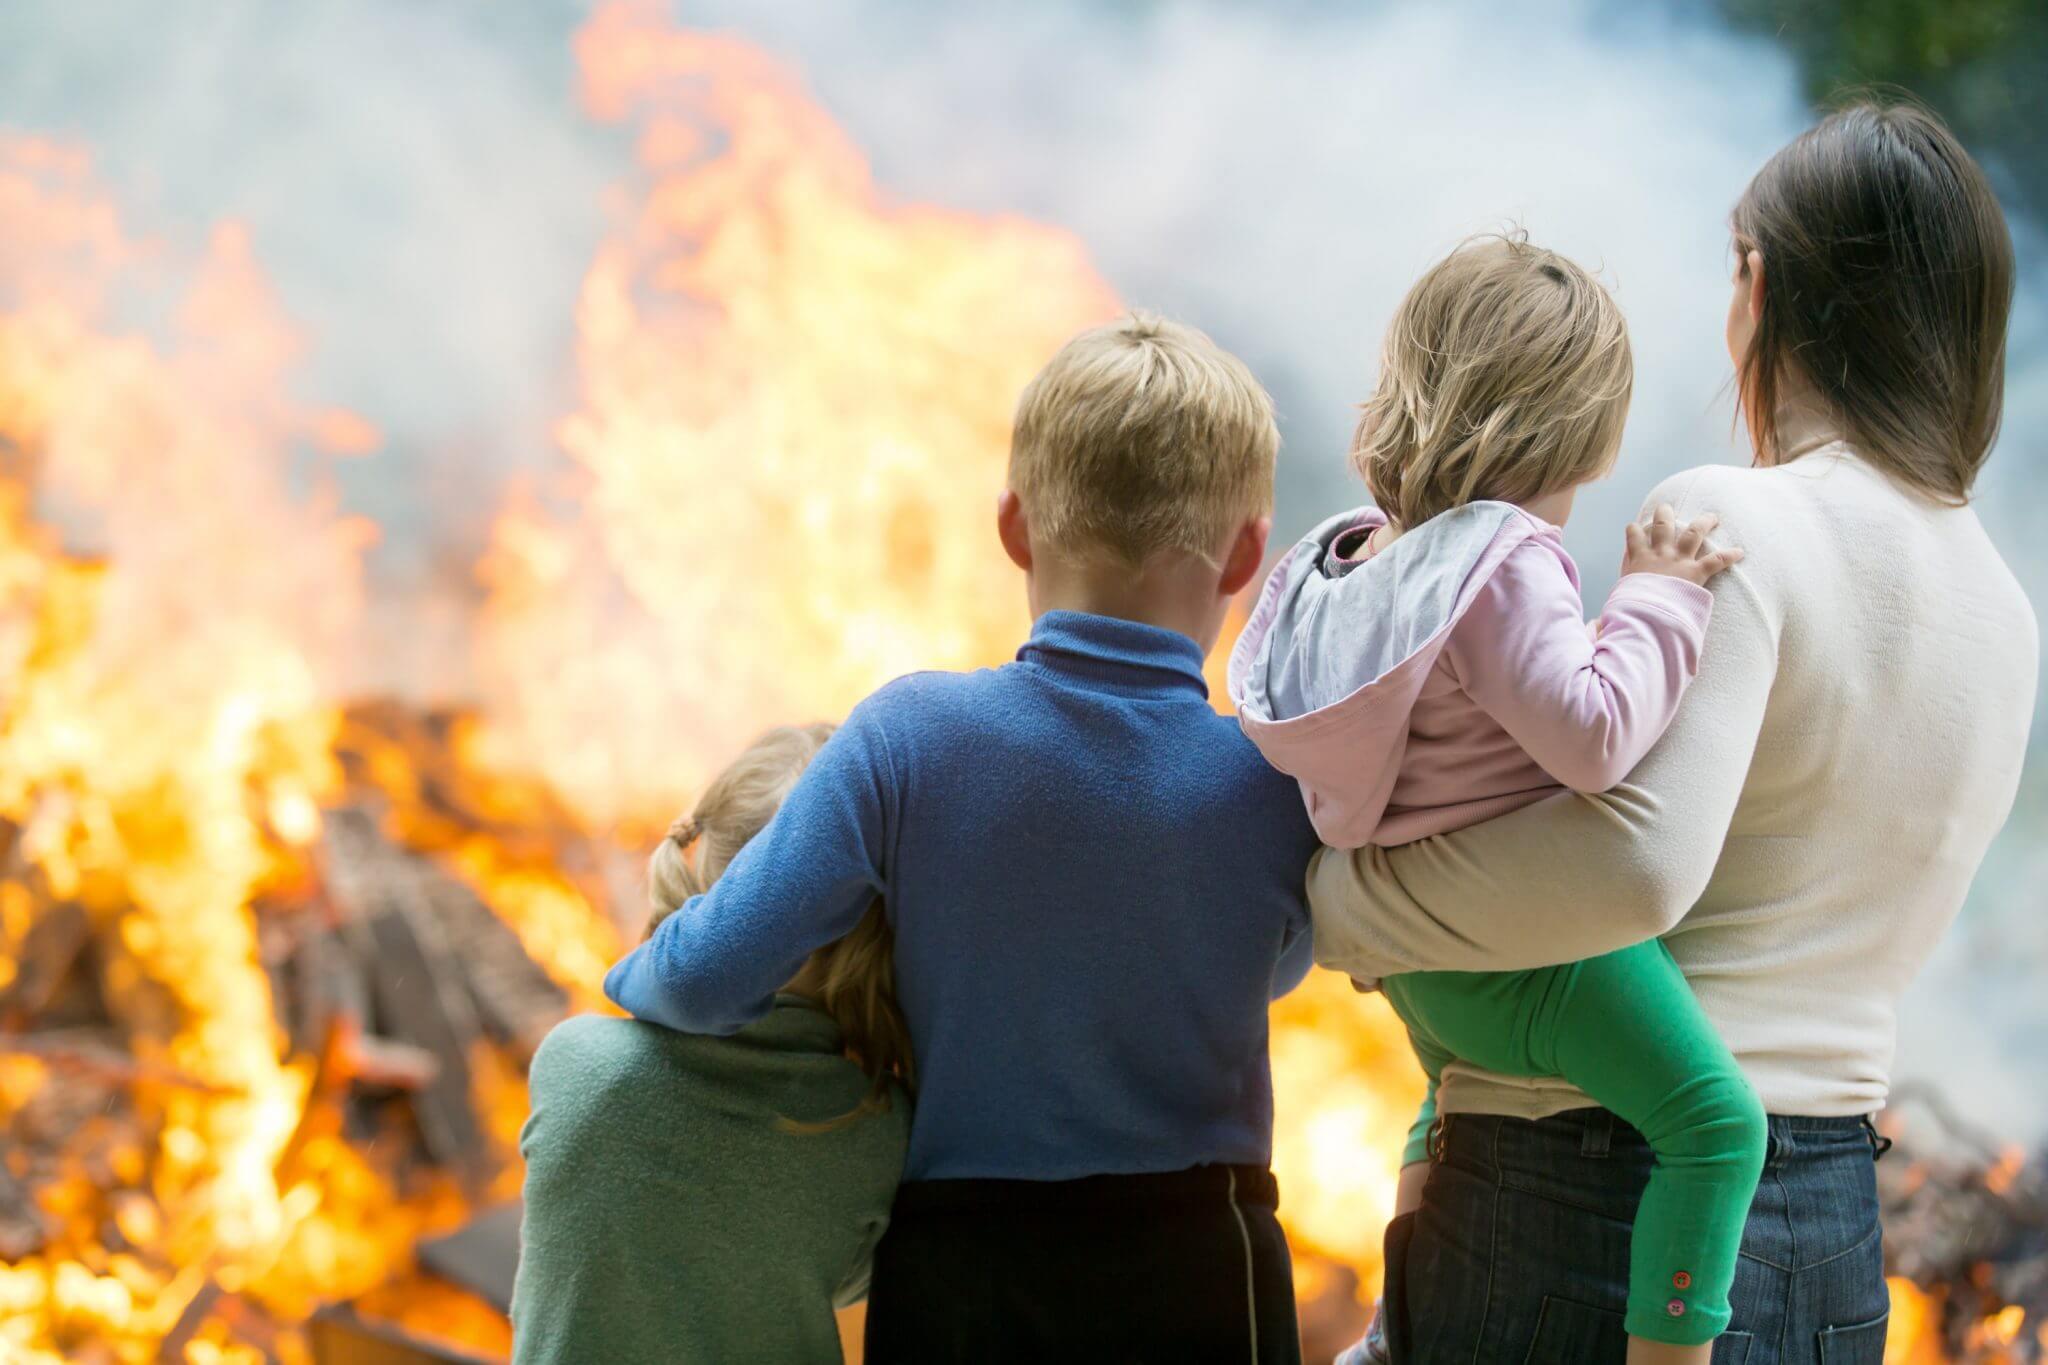 A Family beside A Fire